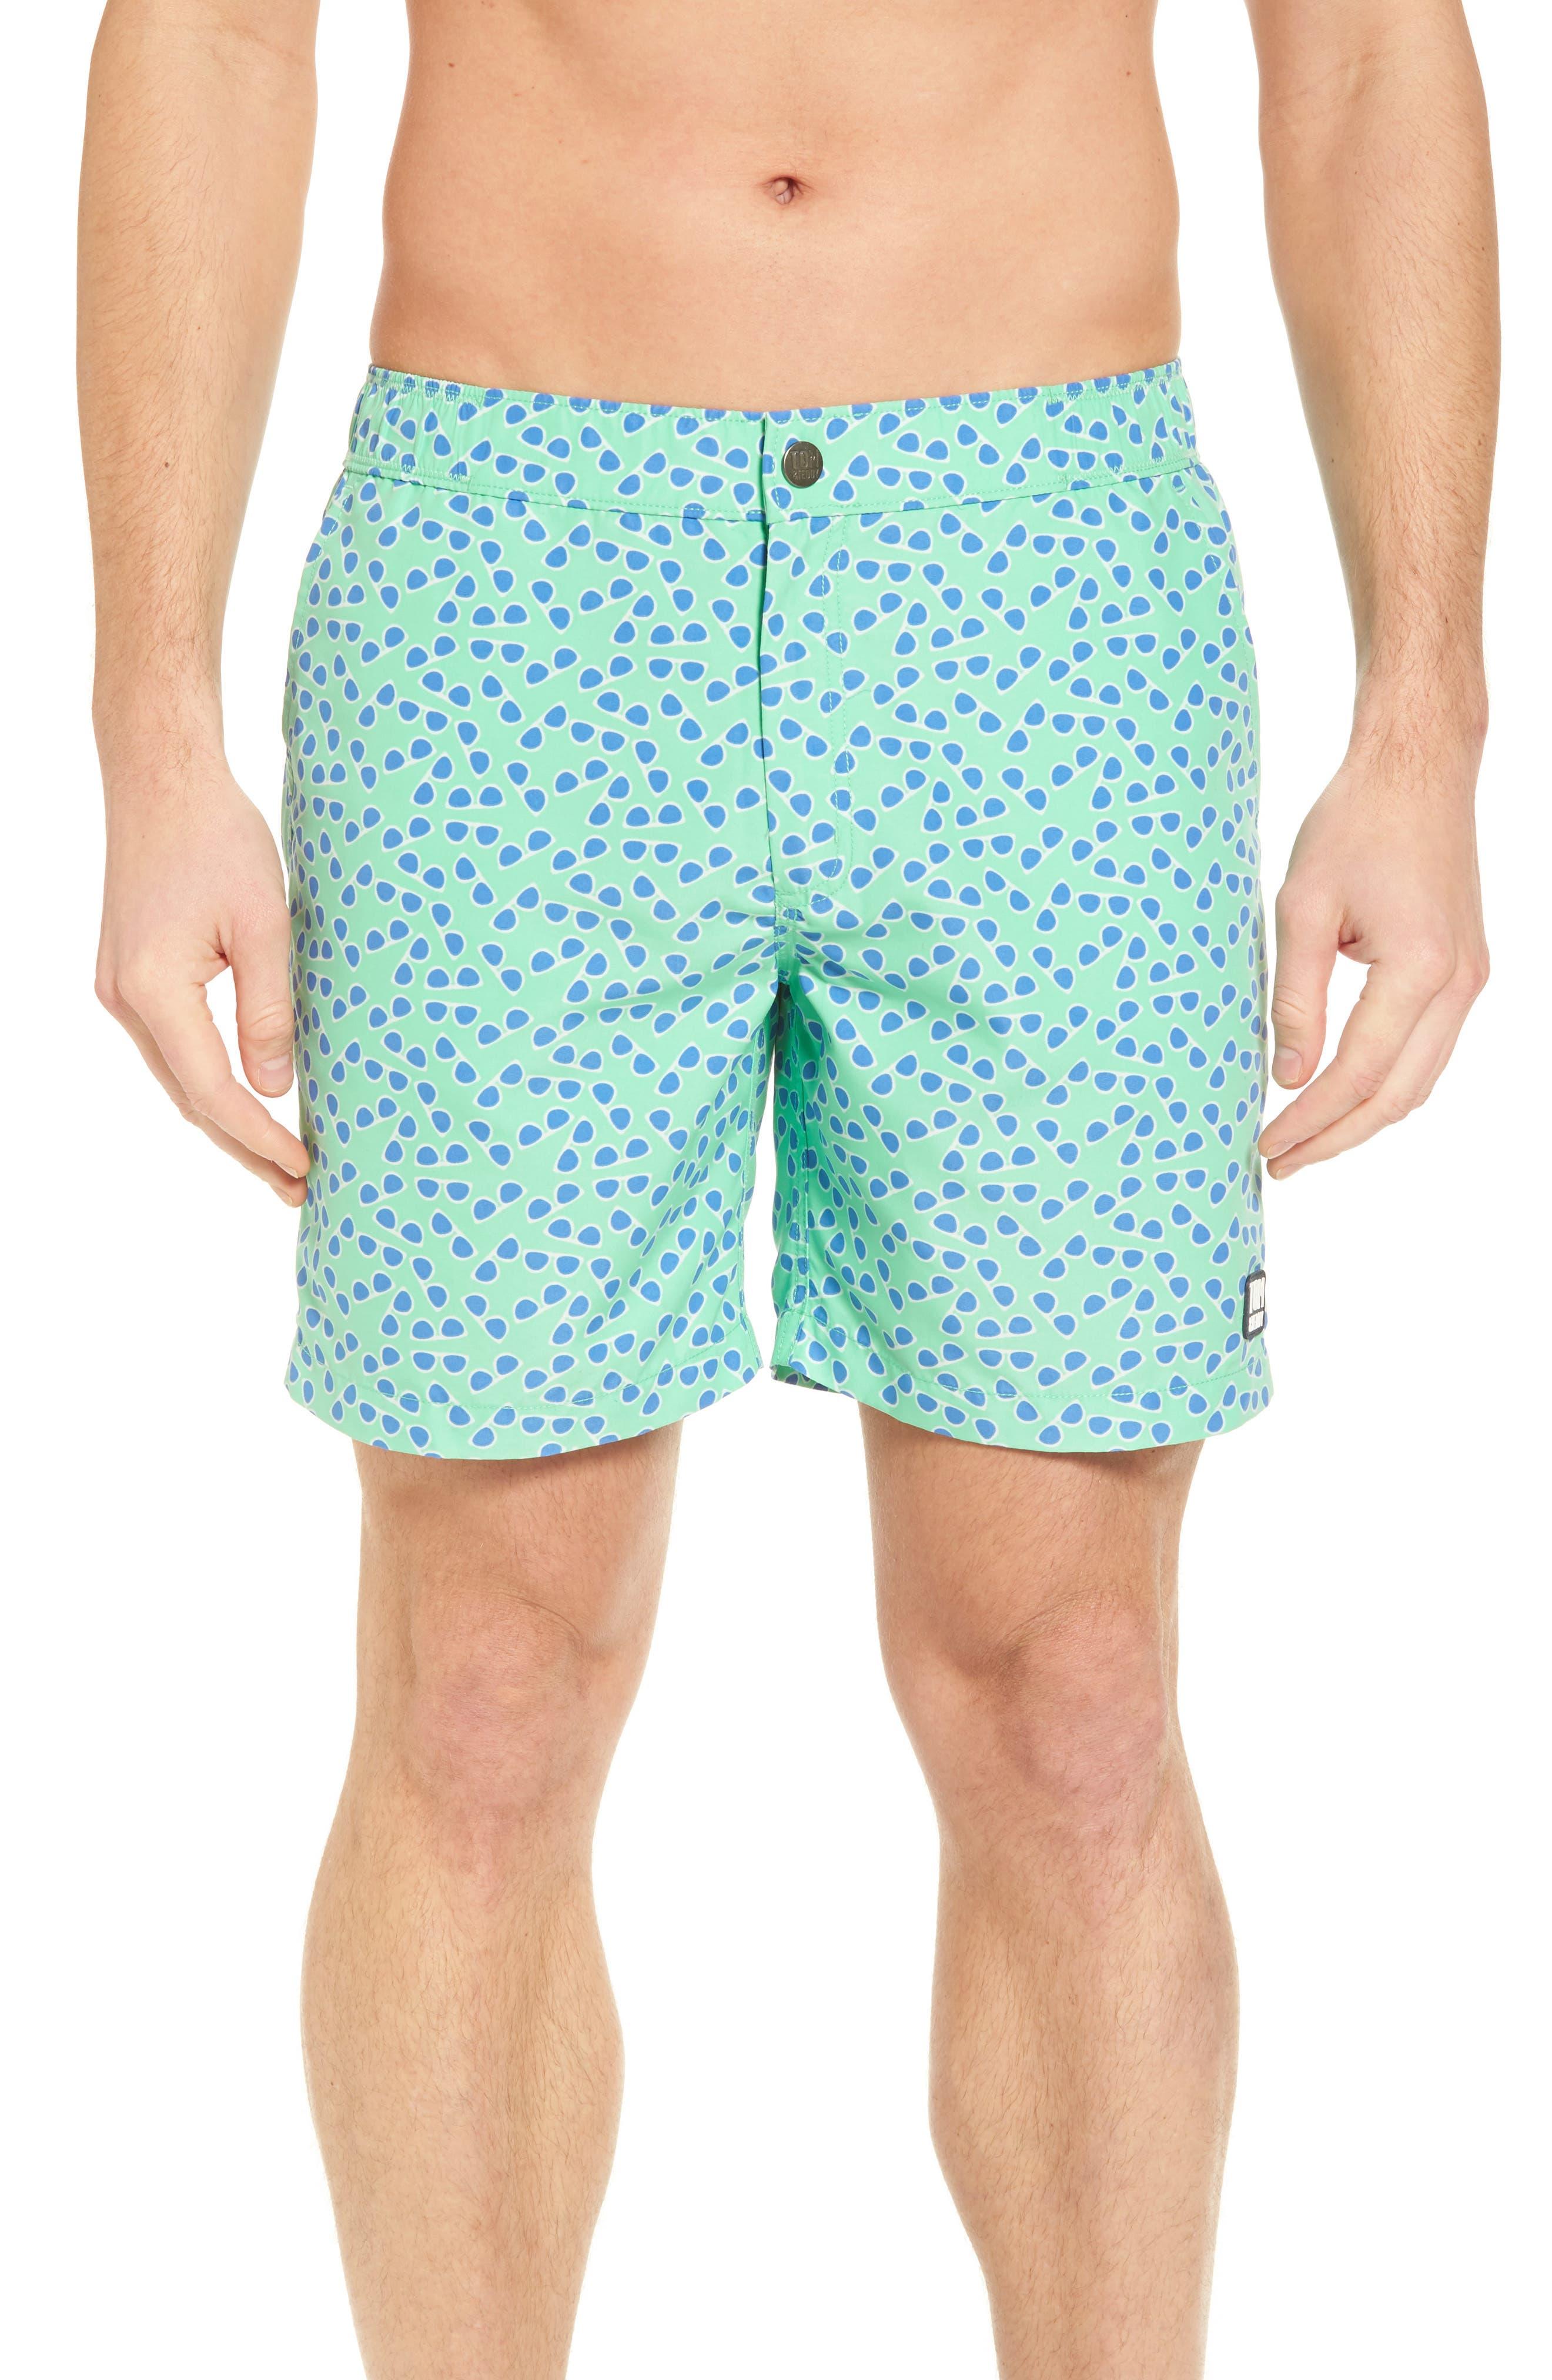 Sunglasses Print Swim Trunks,                         Main,                         color,